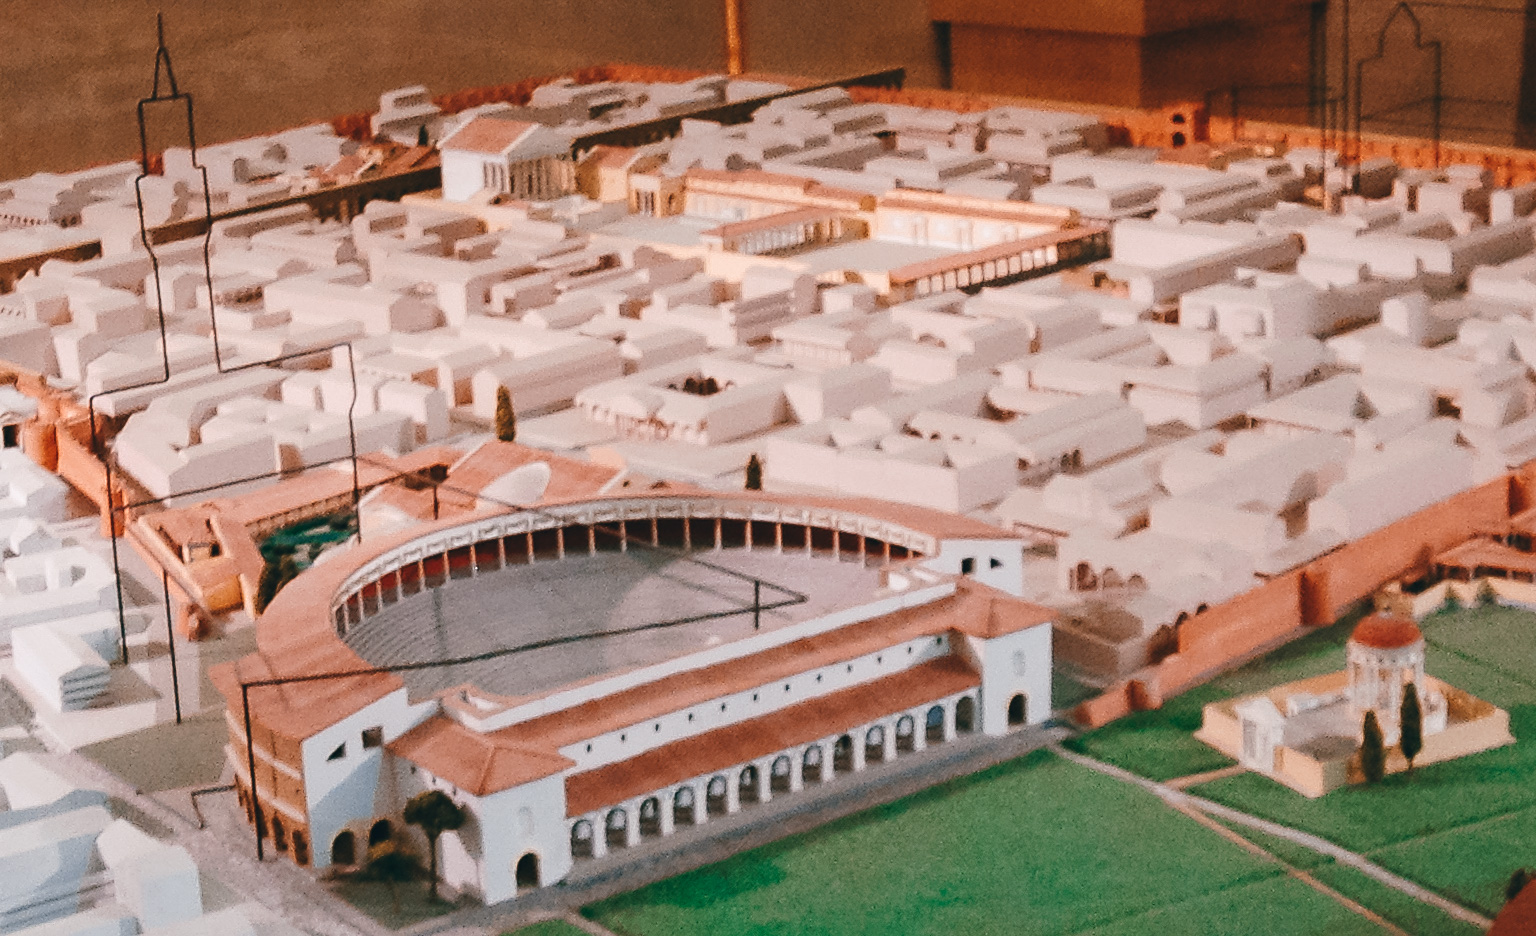 Florentine Municipal Museums